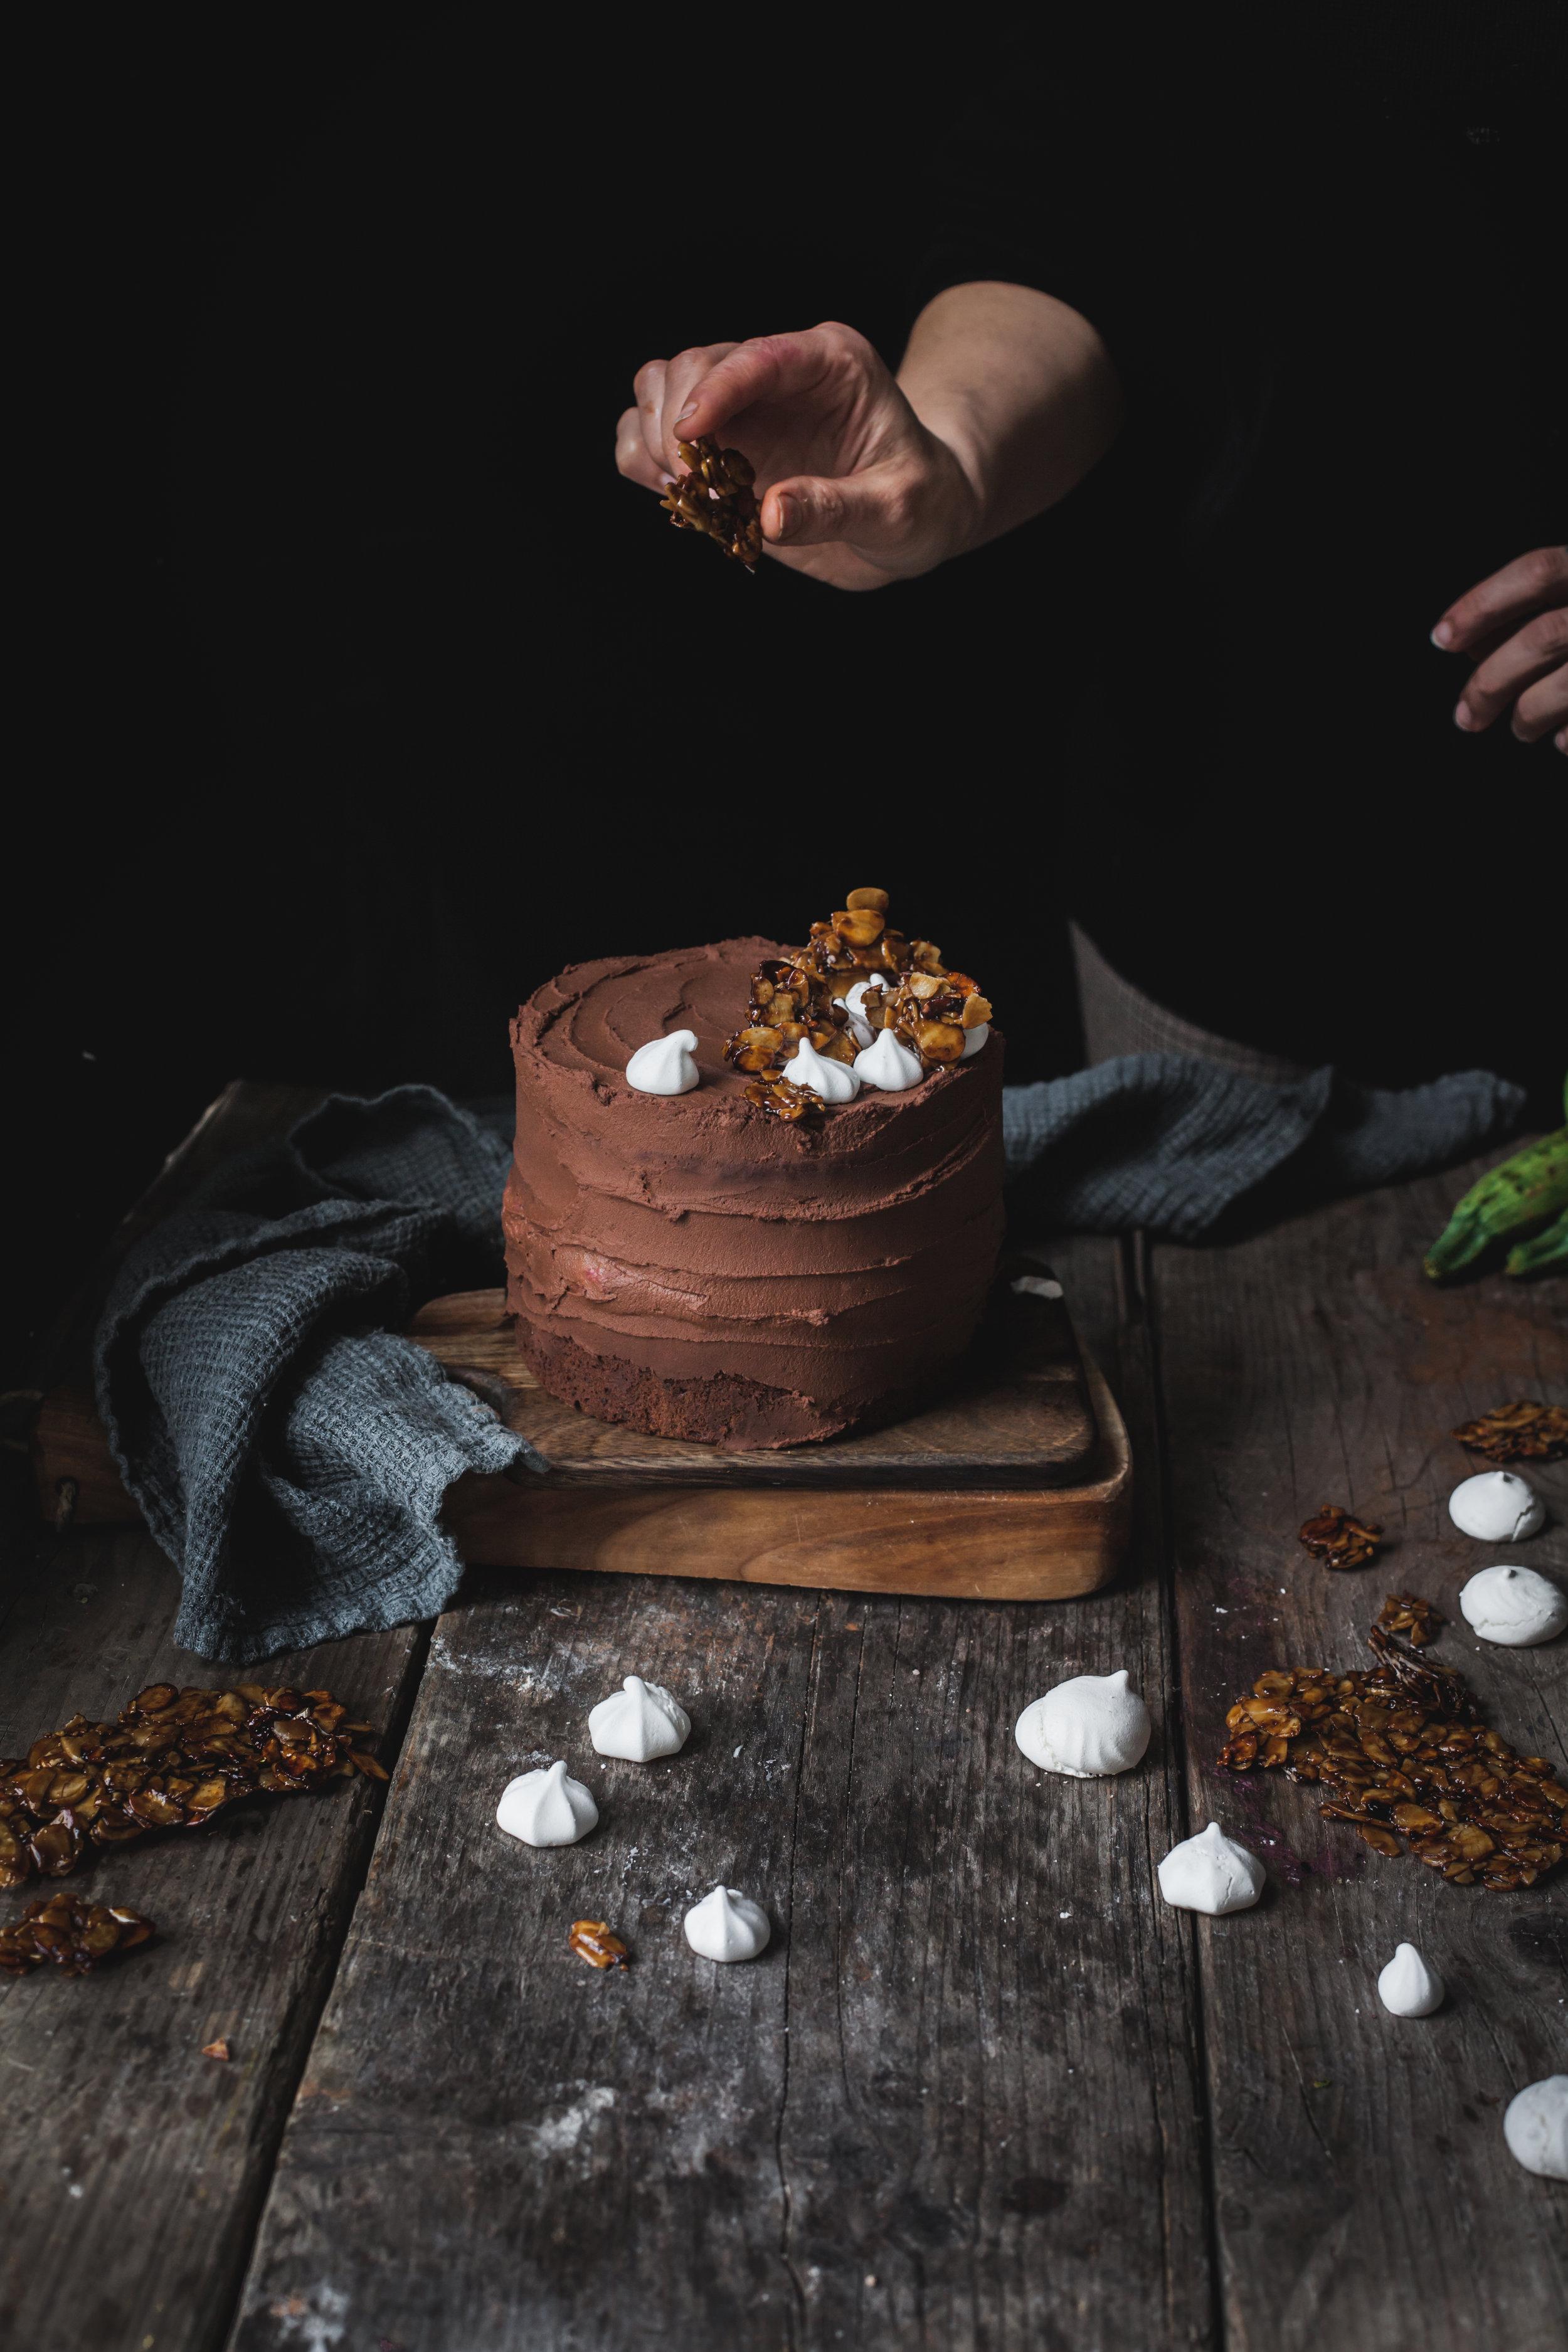 vegan zucchini chocolate cake with almond brittle